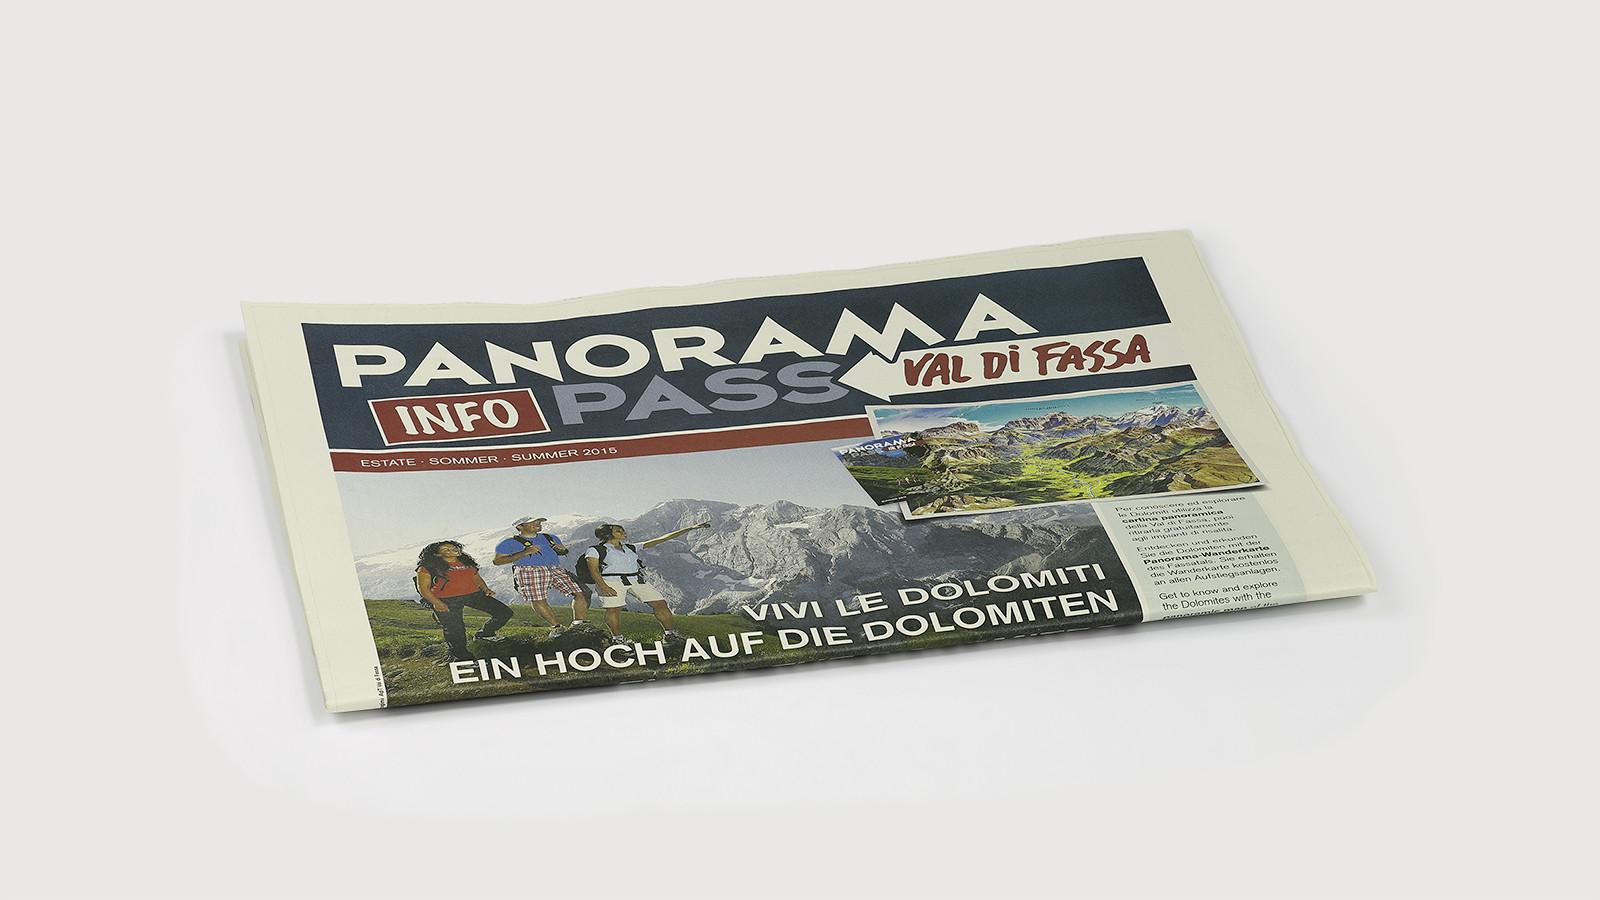 Panorama Pass